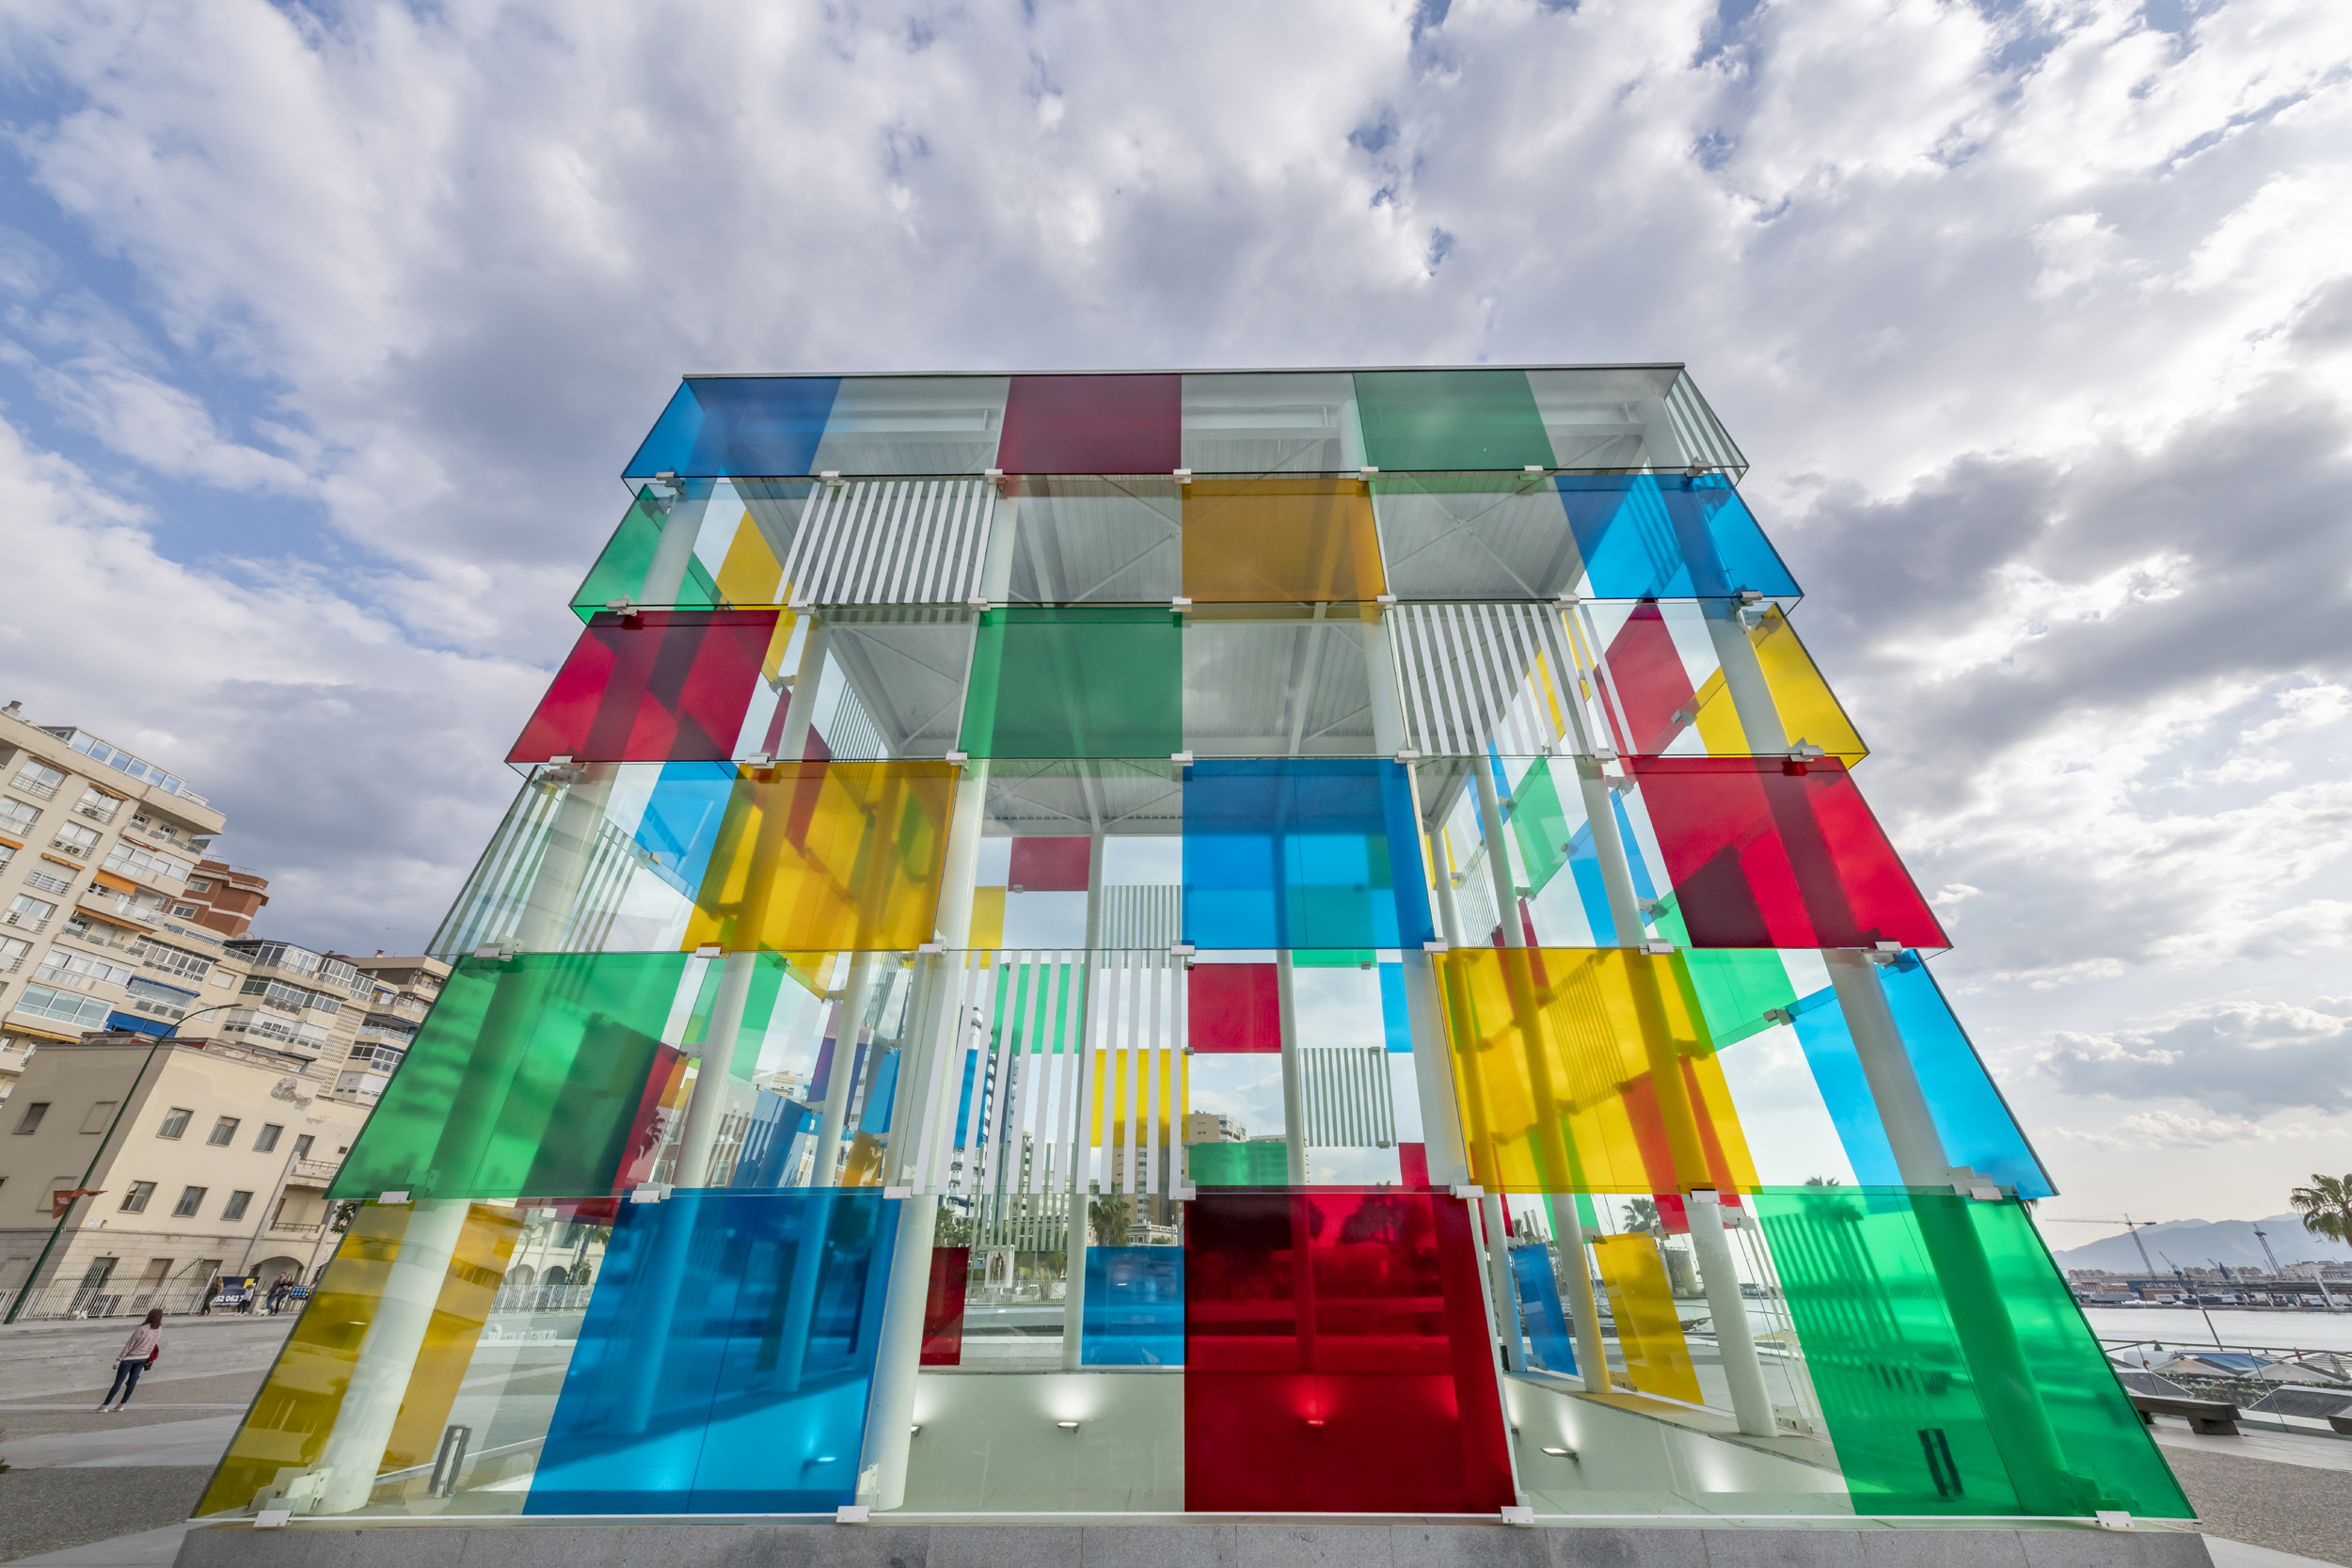 Centre Pompidou Museum building - Malaga, Spain